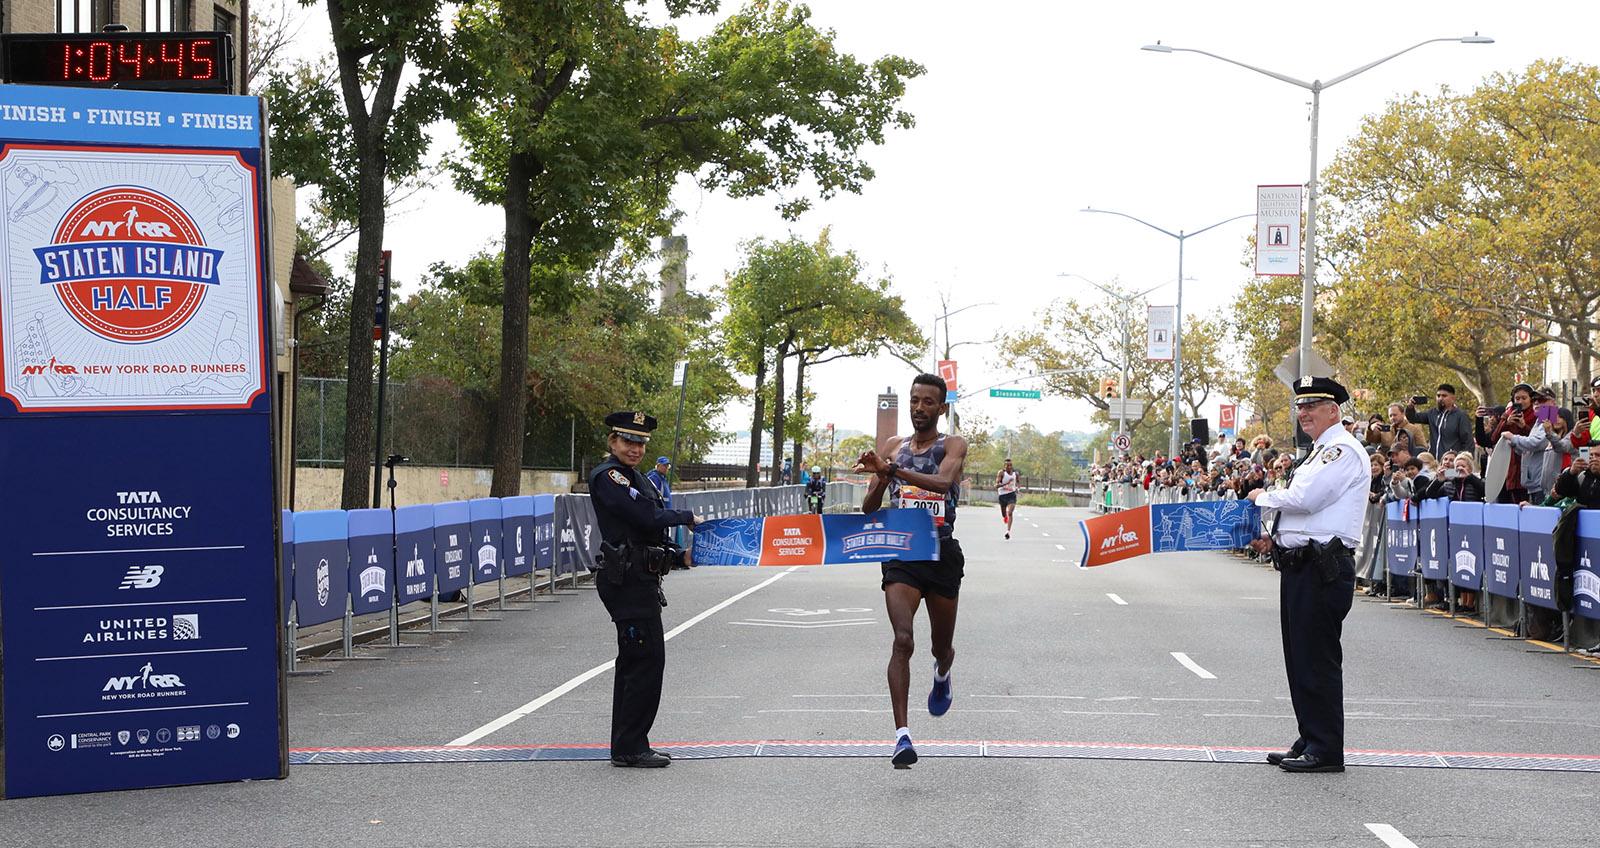 Tariku Demelash Abera breaks the tape at the Staten Island Half